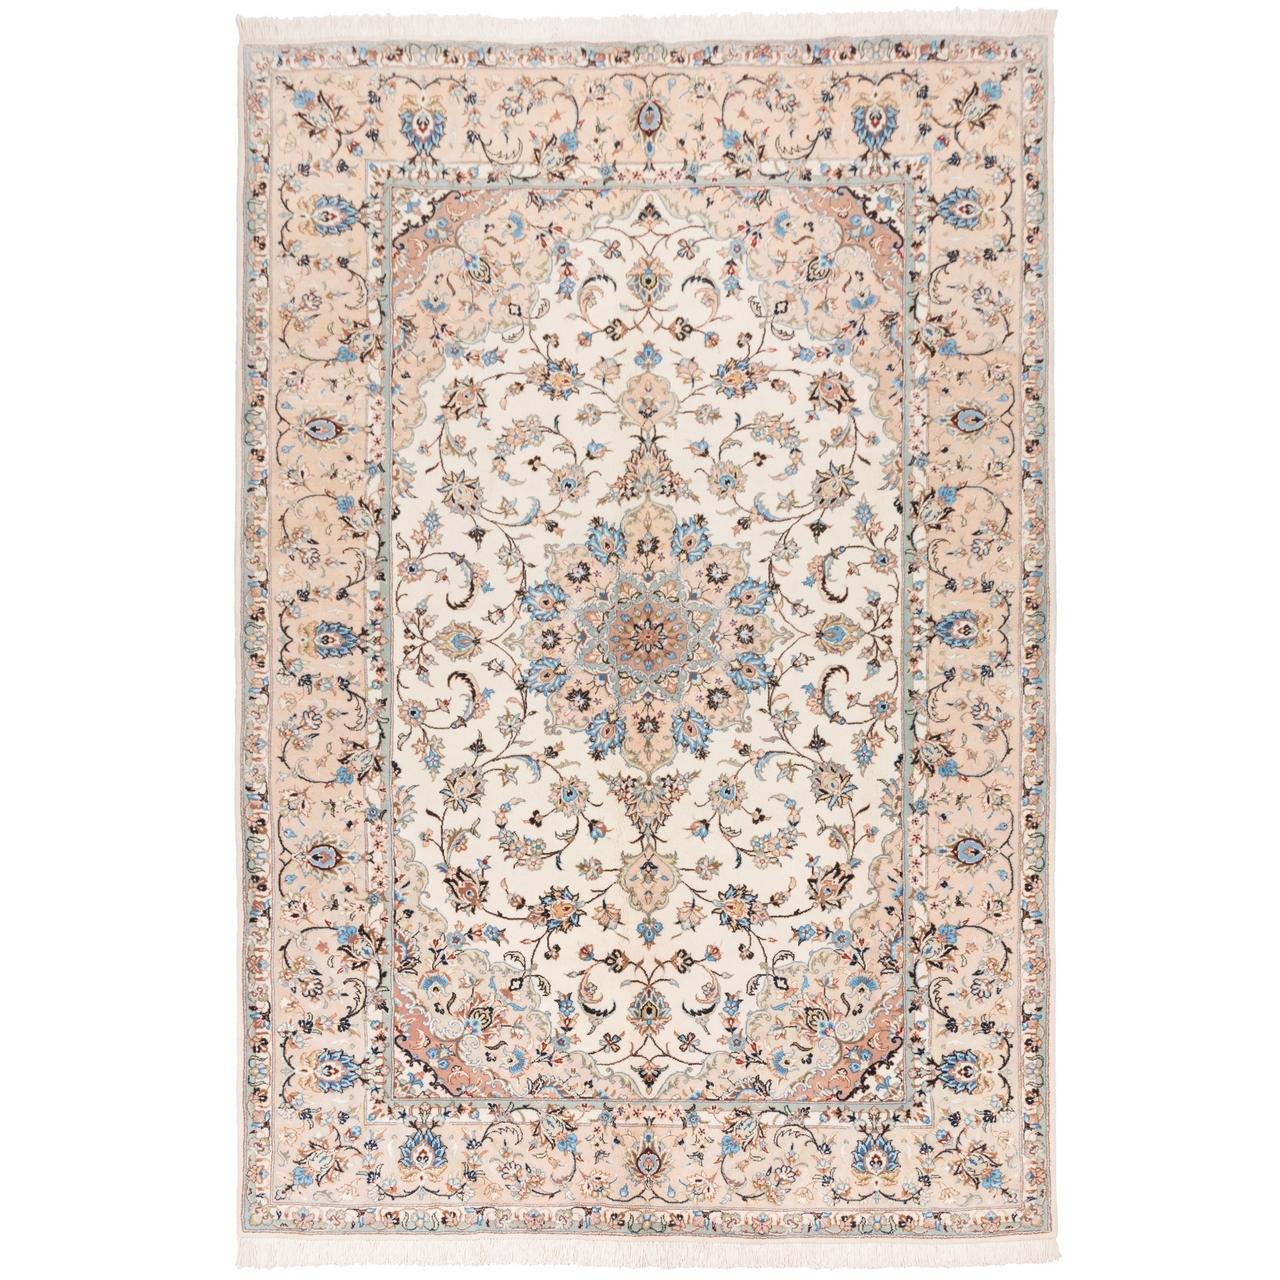 فرش دستباف شش متری سی پرشیا کد 174171